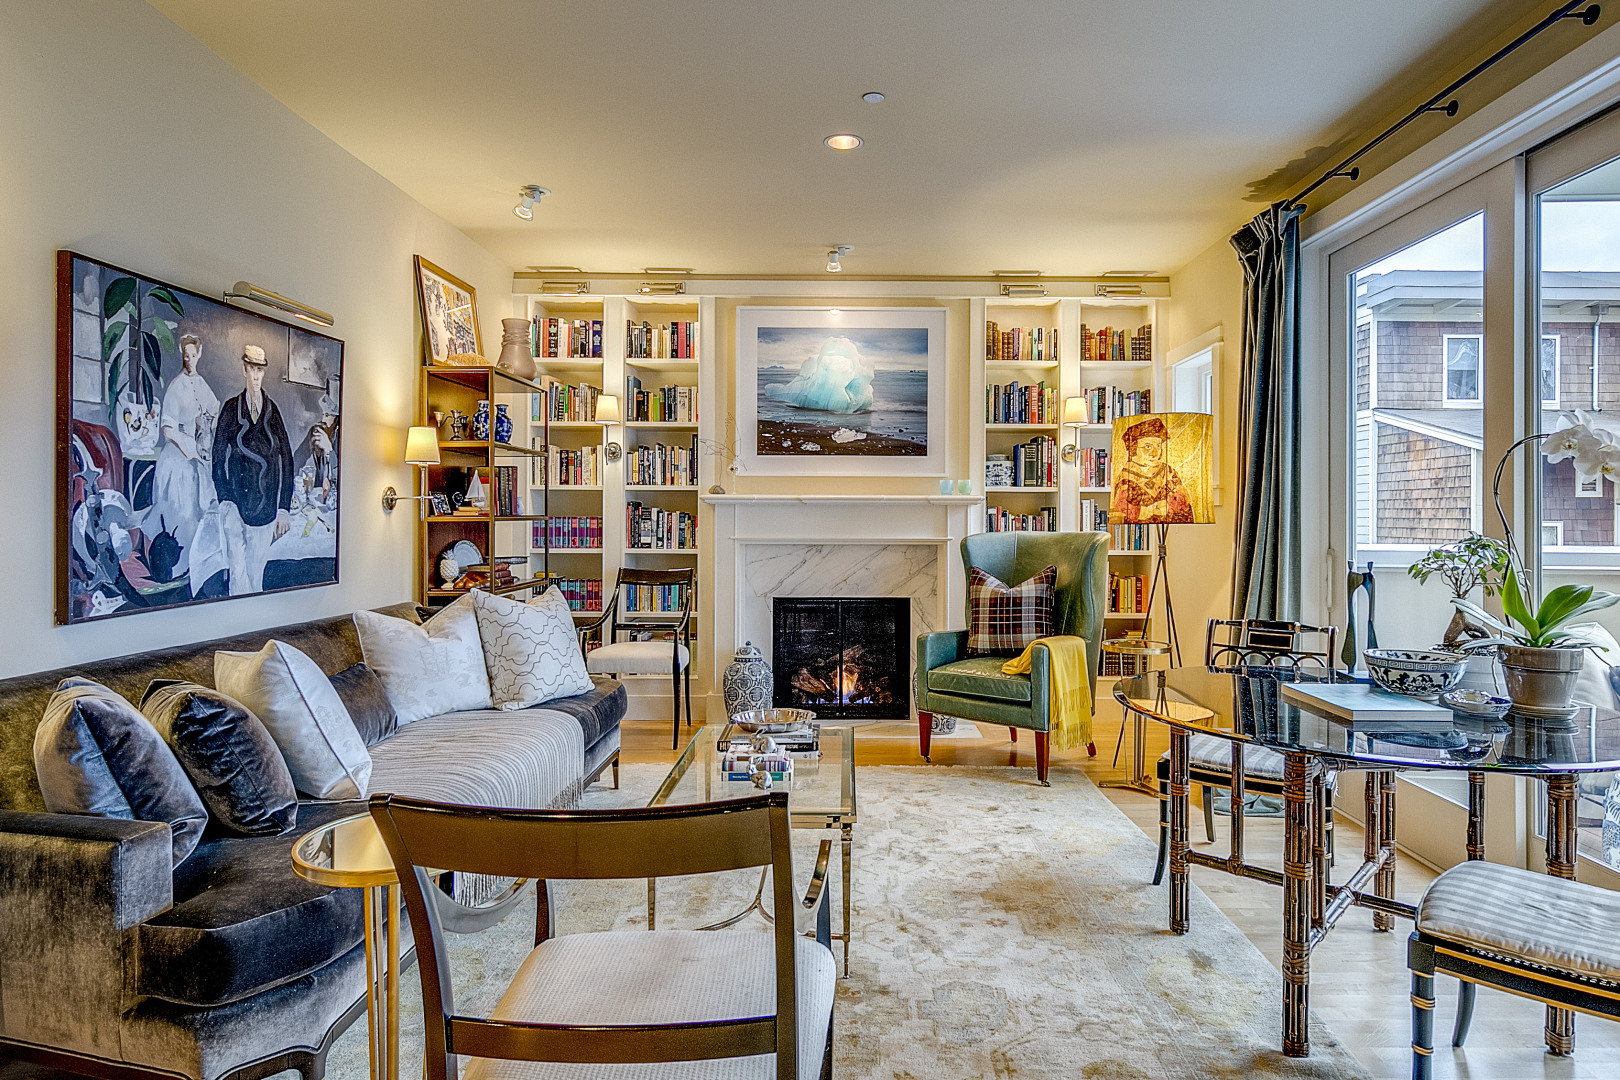 Sitting Room in a Home in Bainbridge Island WA